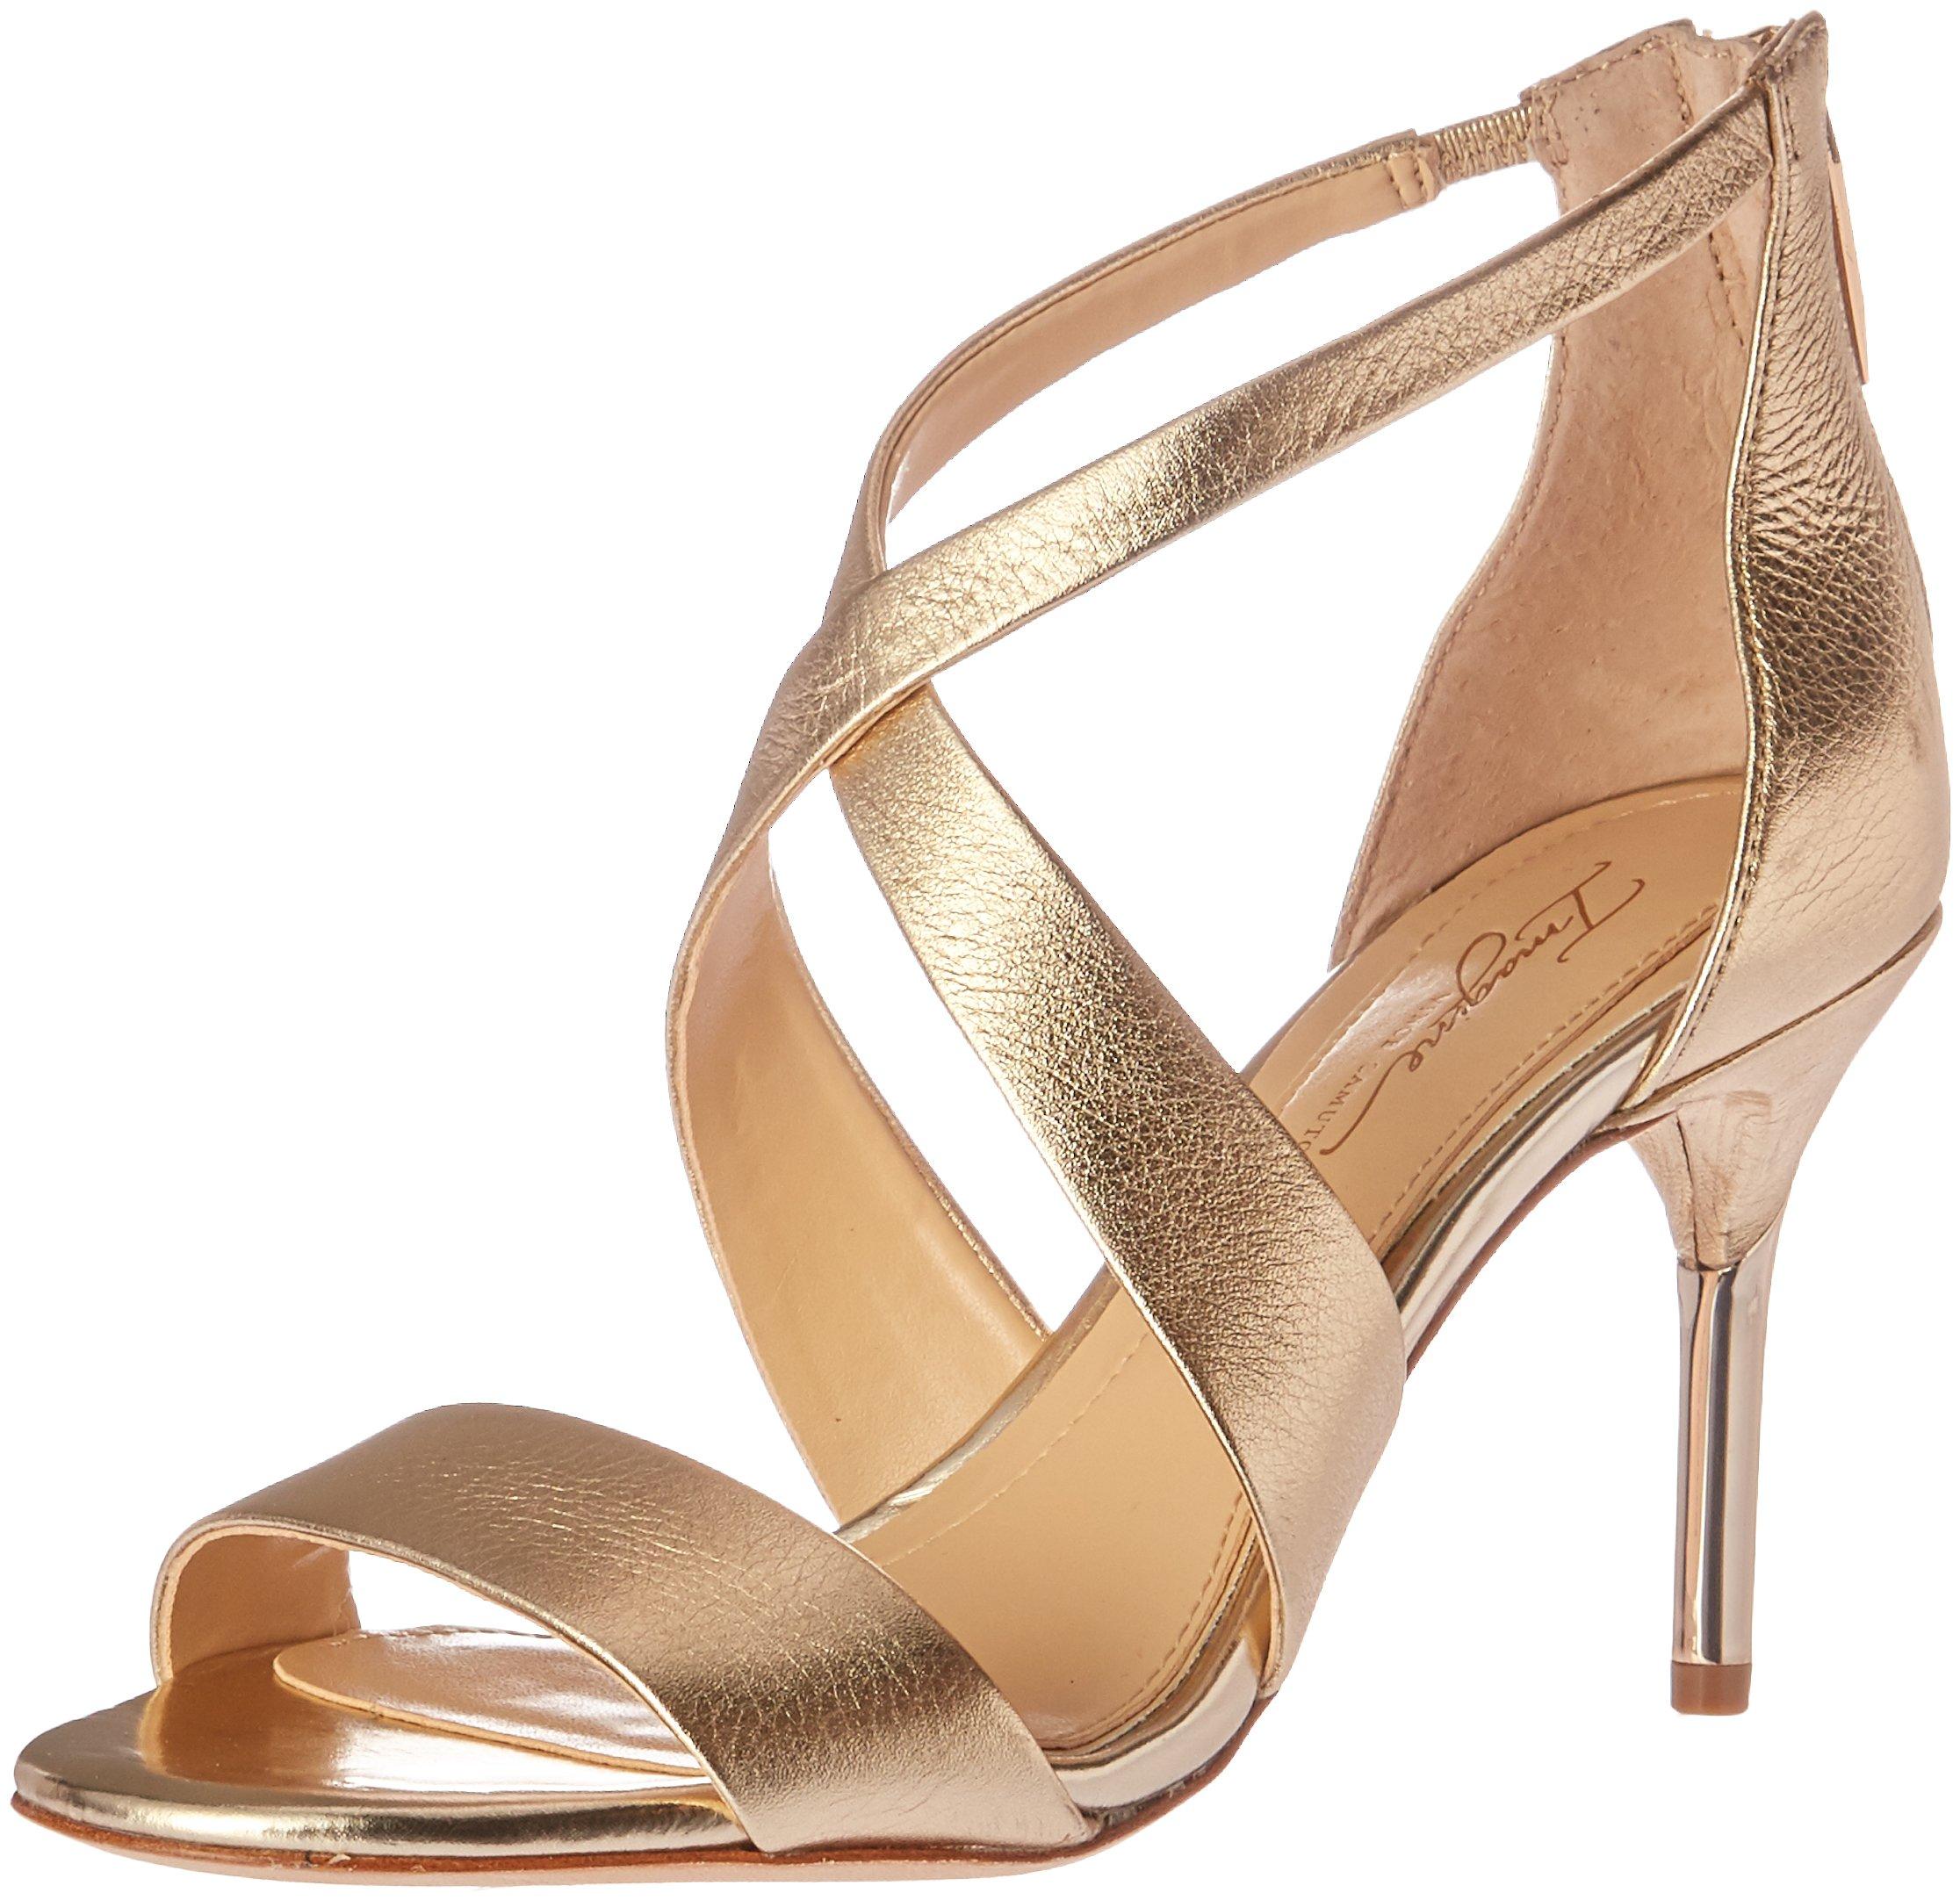 Imagine Vince Camuto Women's PASCAL2 Heeled Sandal, Soft Gold, 5.5 Medium US